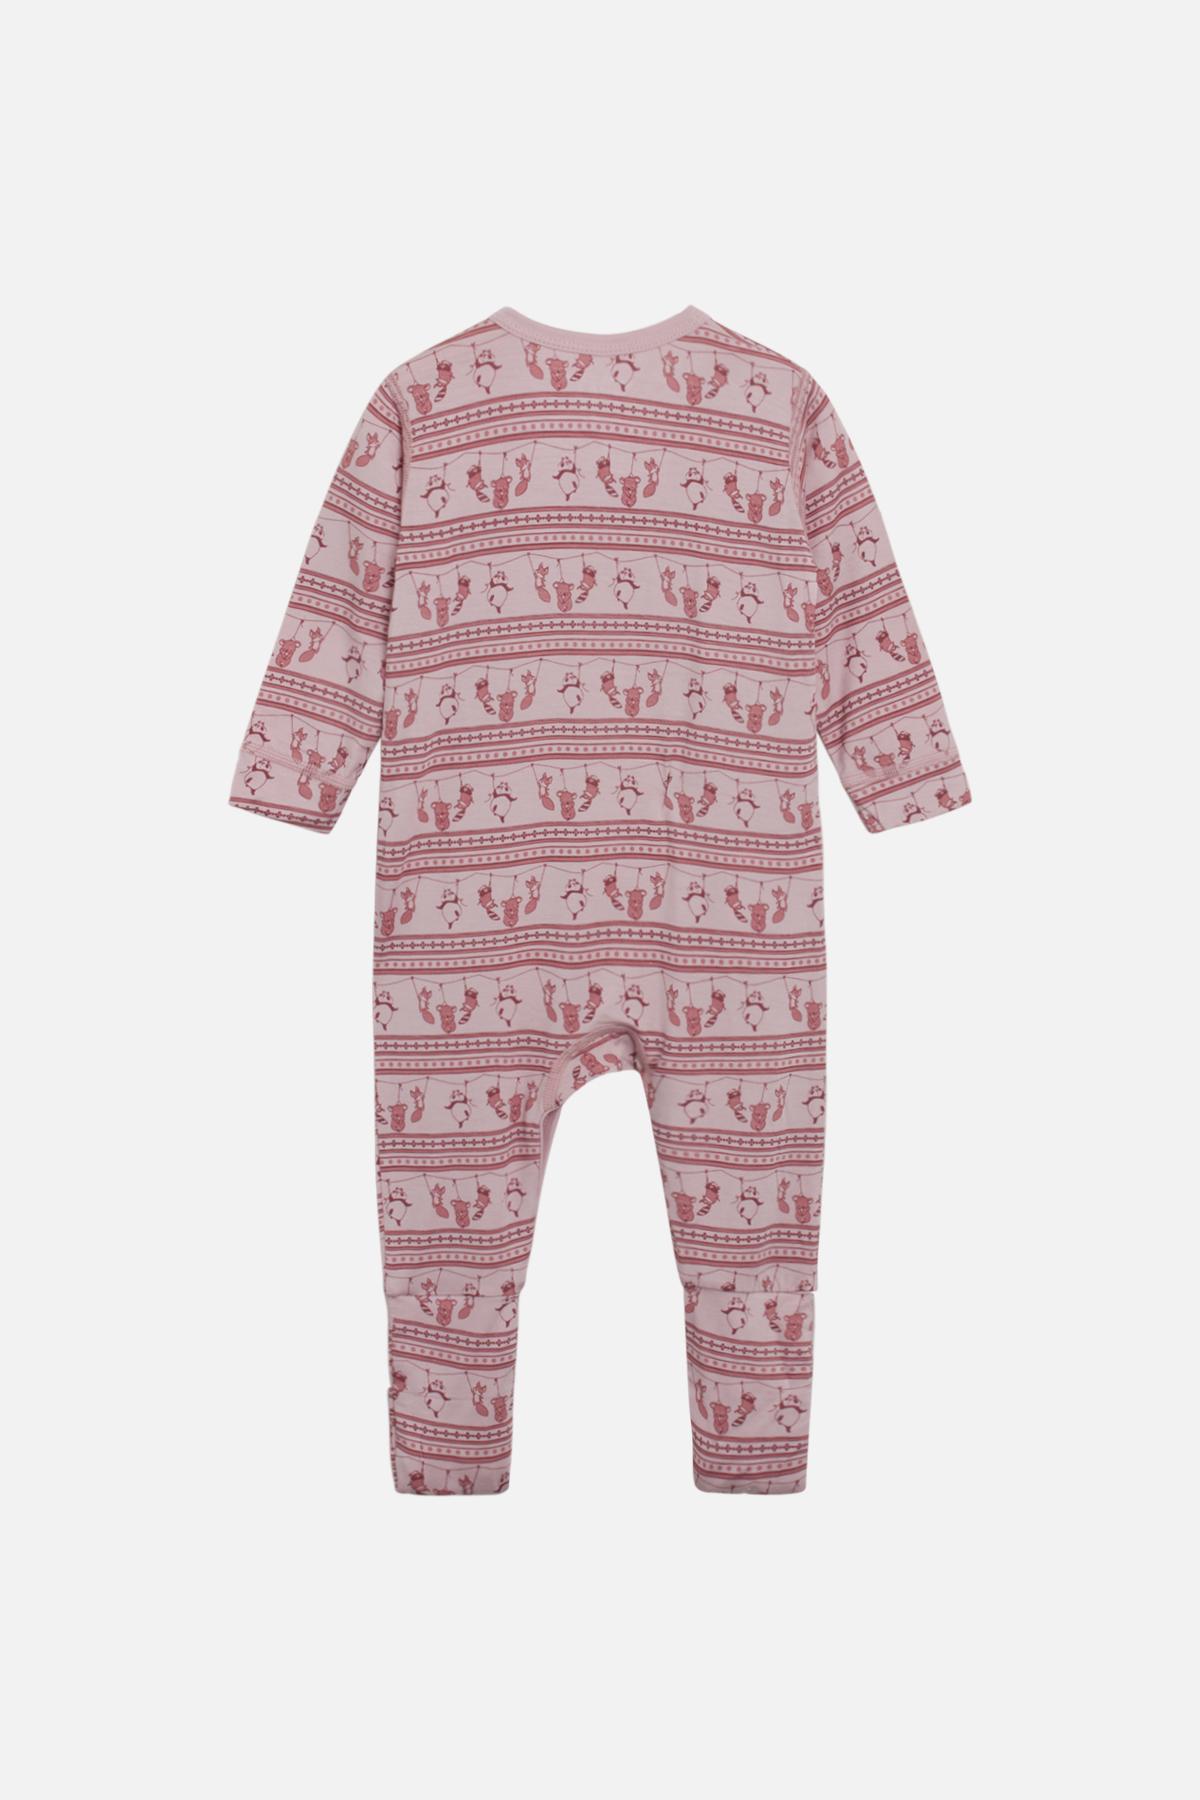 Kids Bamboo - Mulle - Nightwear